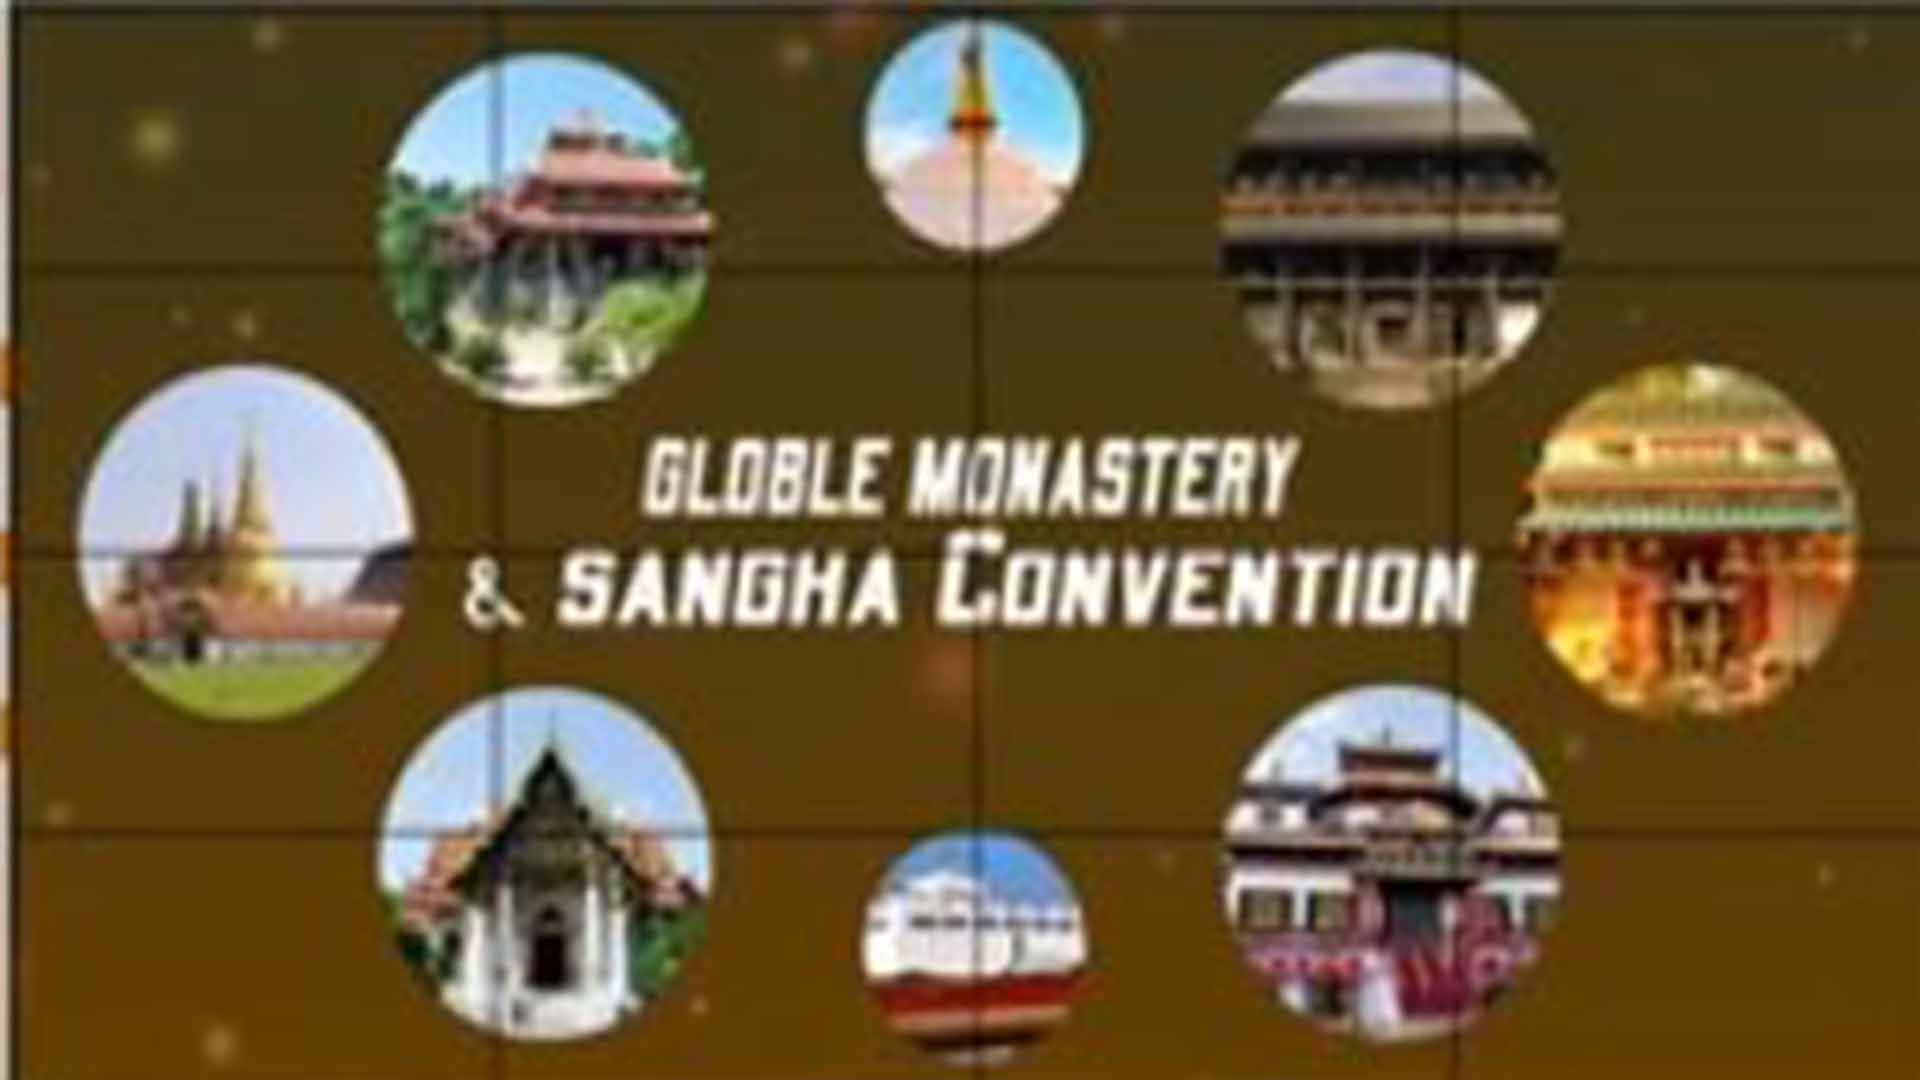 Global Monastery & Sangha Convention